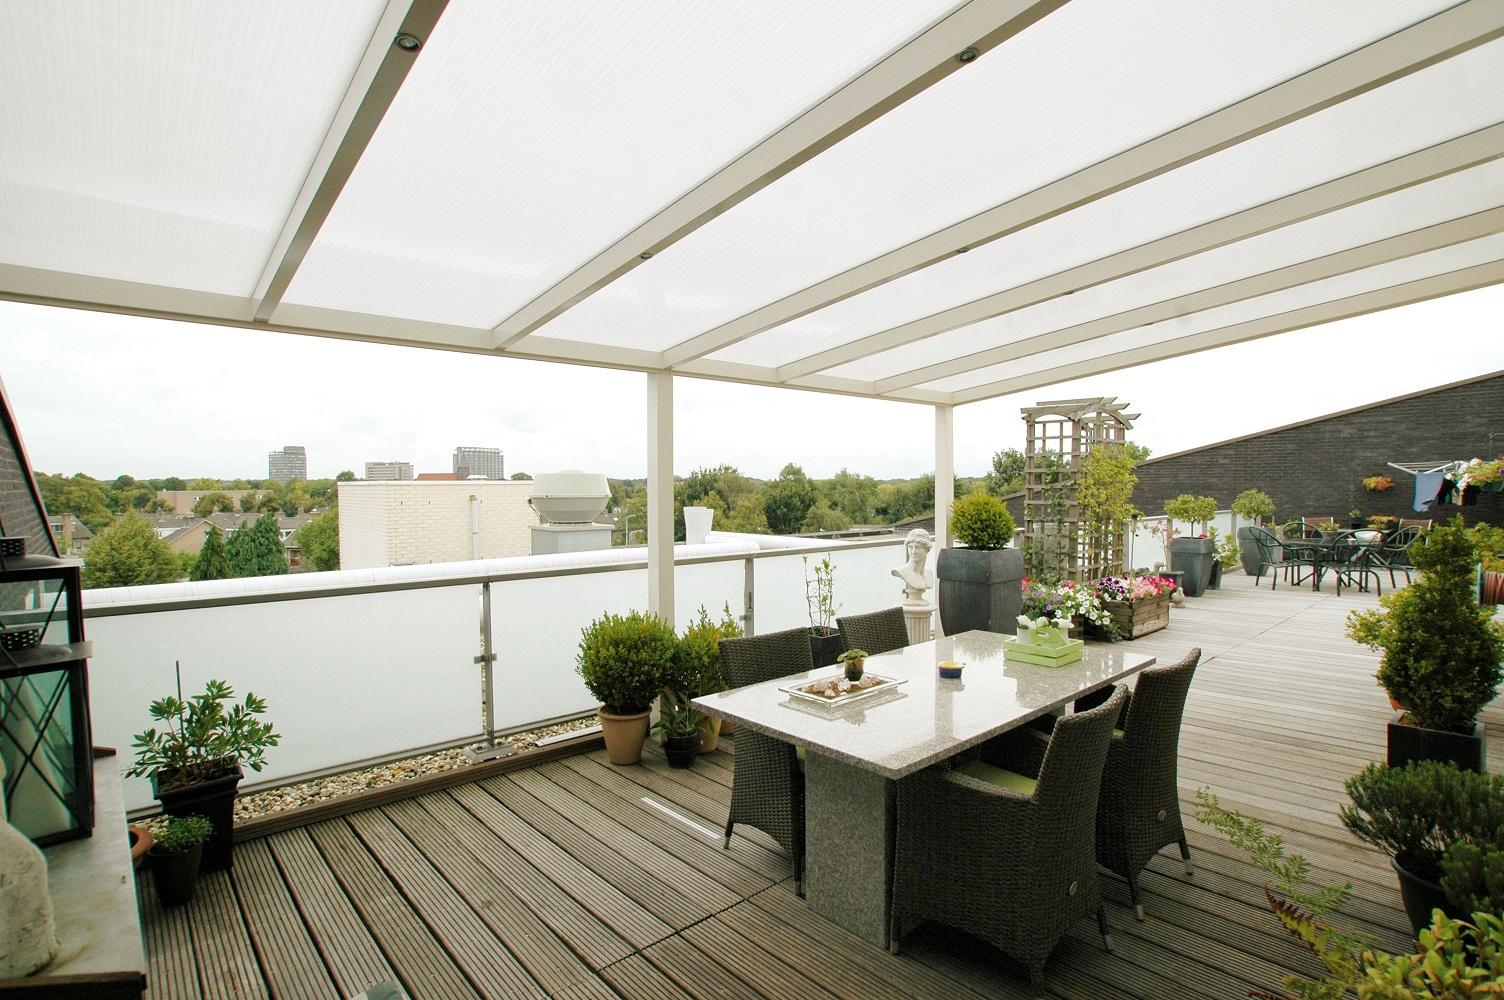 Bilder verandatak - Verandatak i aluminium - Lyse Rom